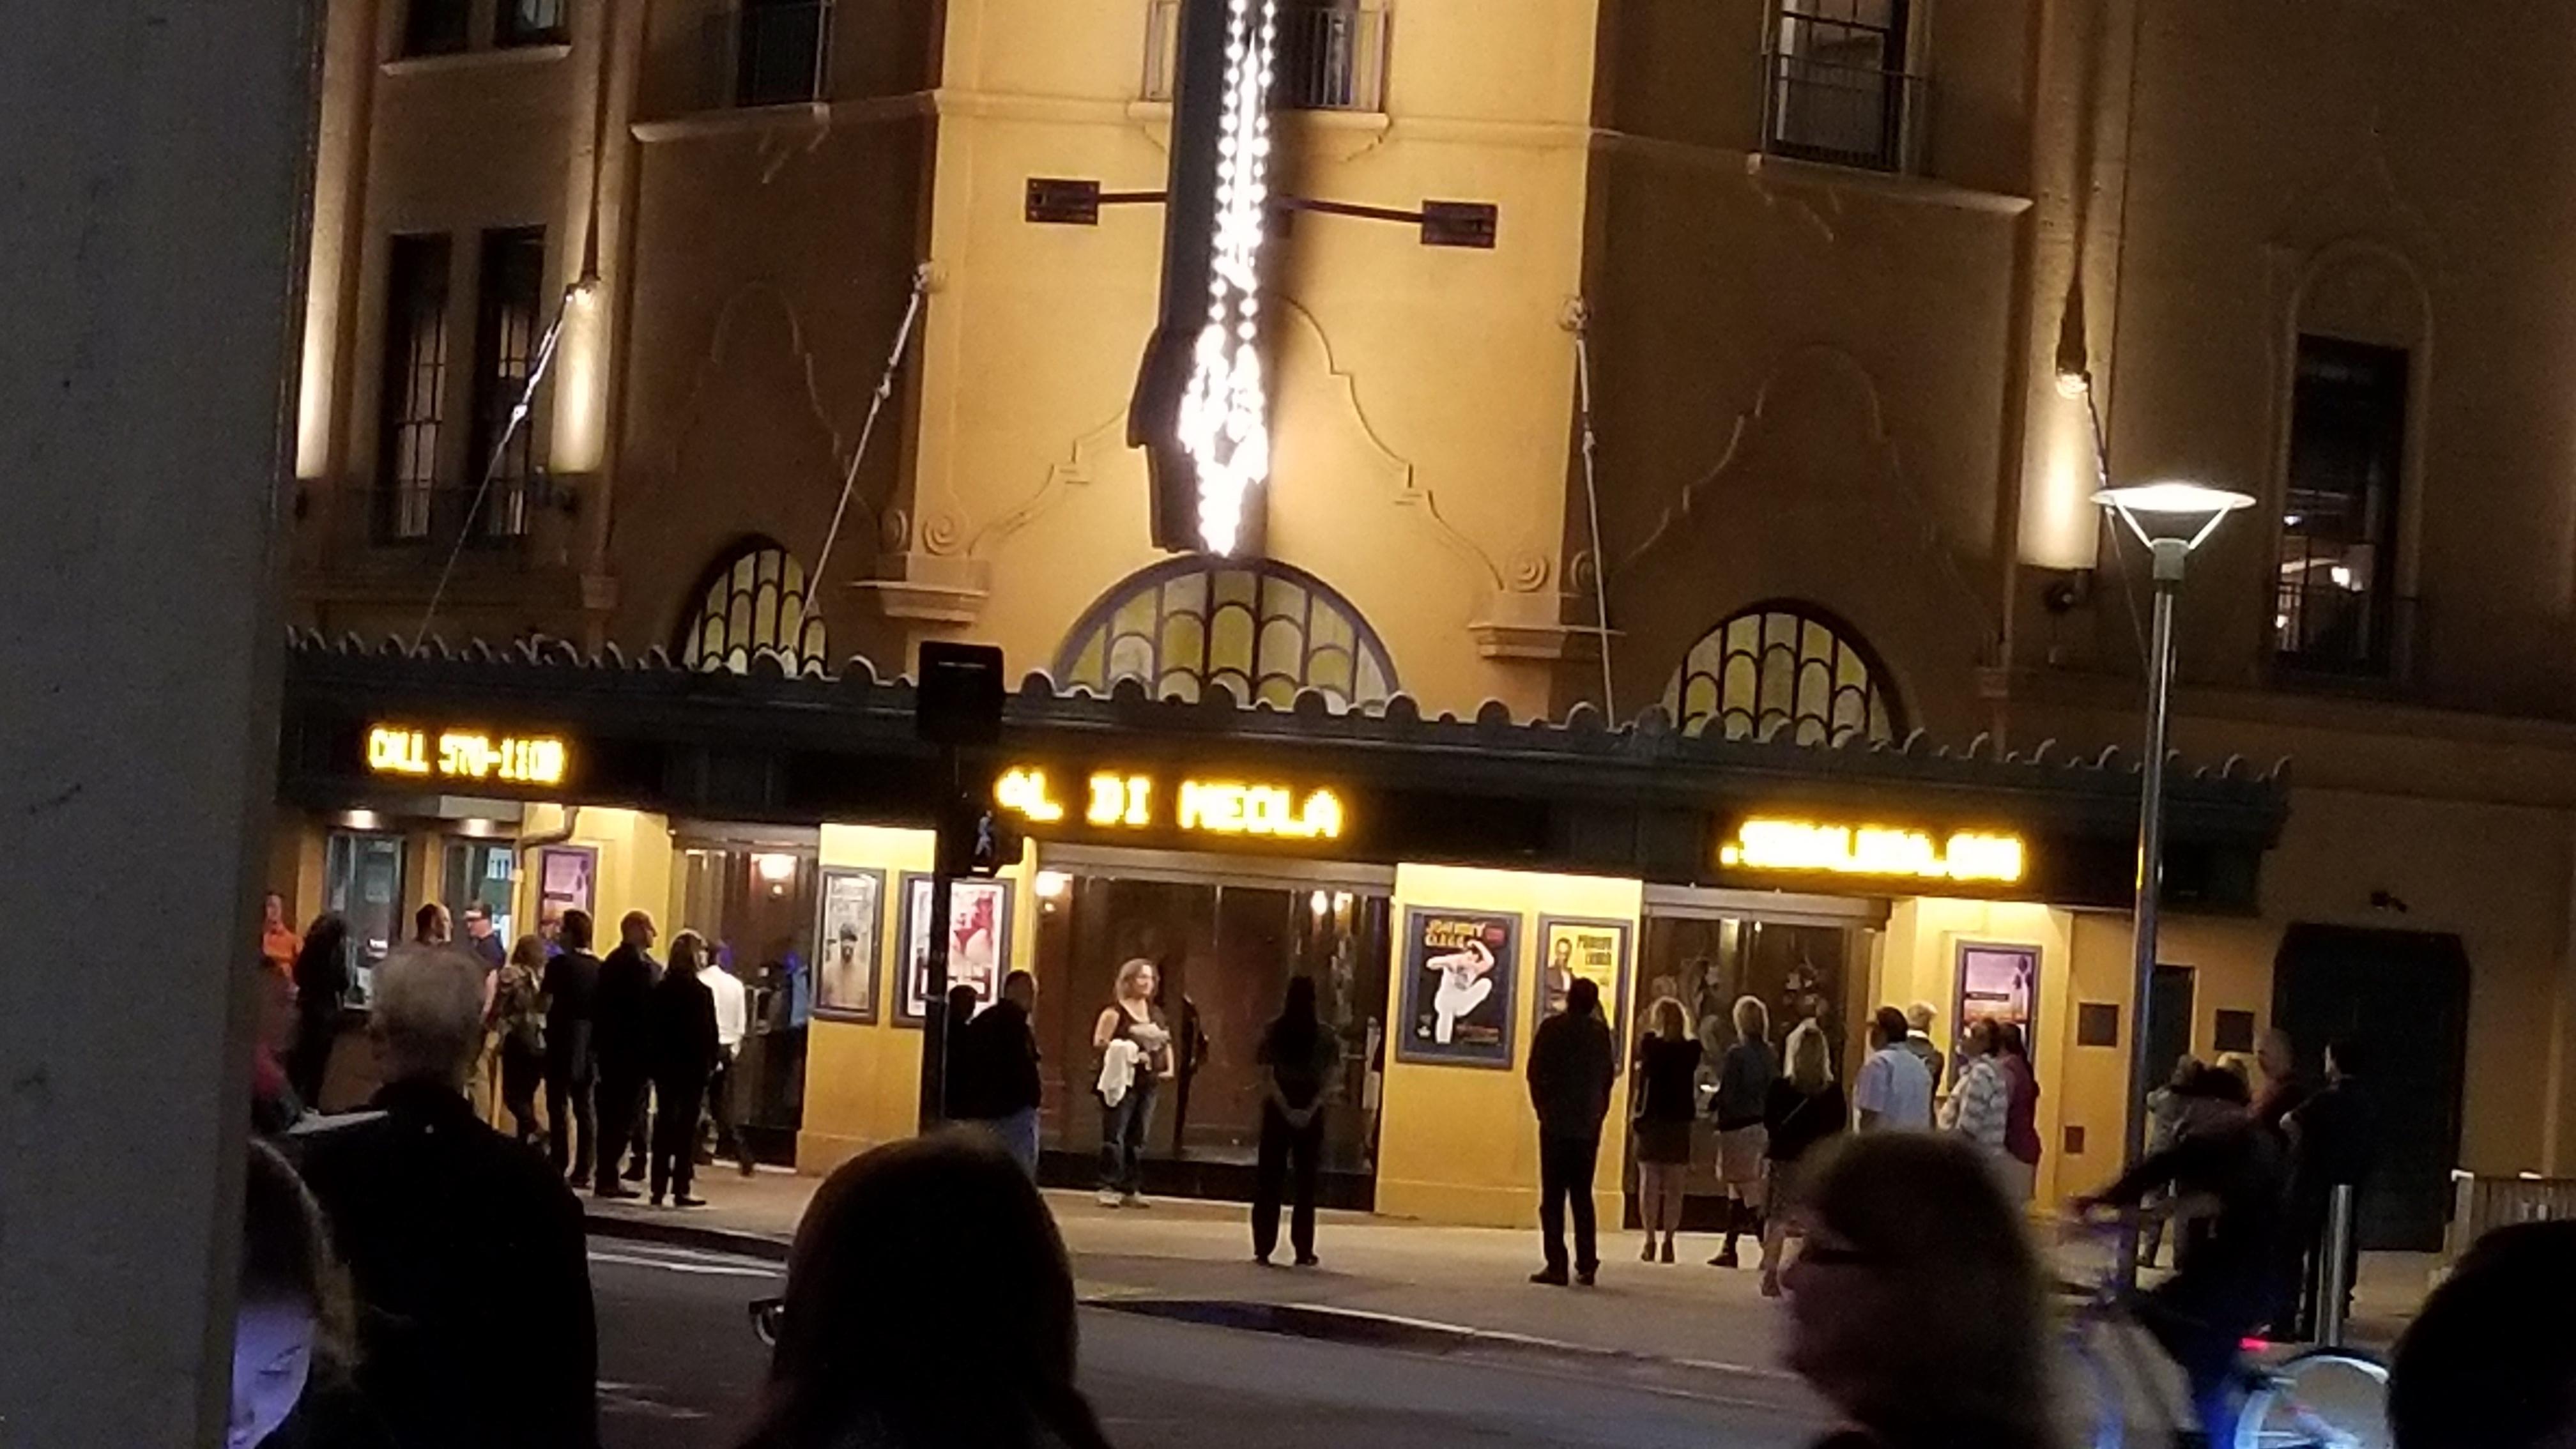 Balboa Theater Presenting Al Di Meola